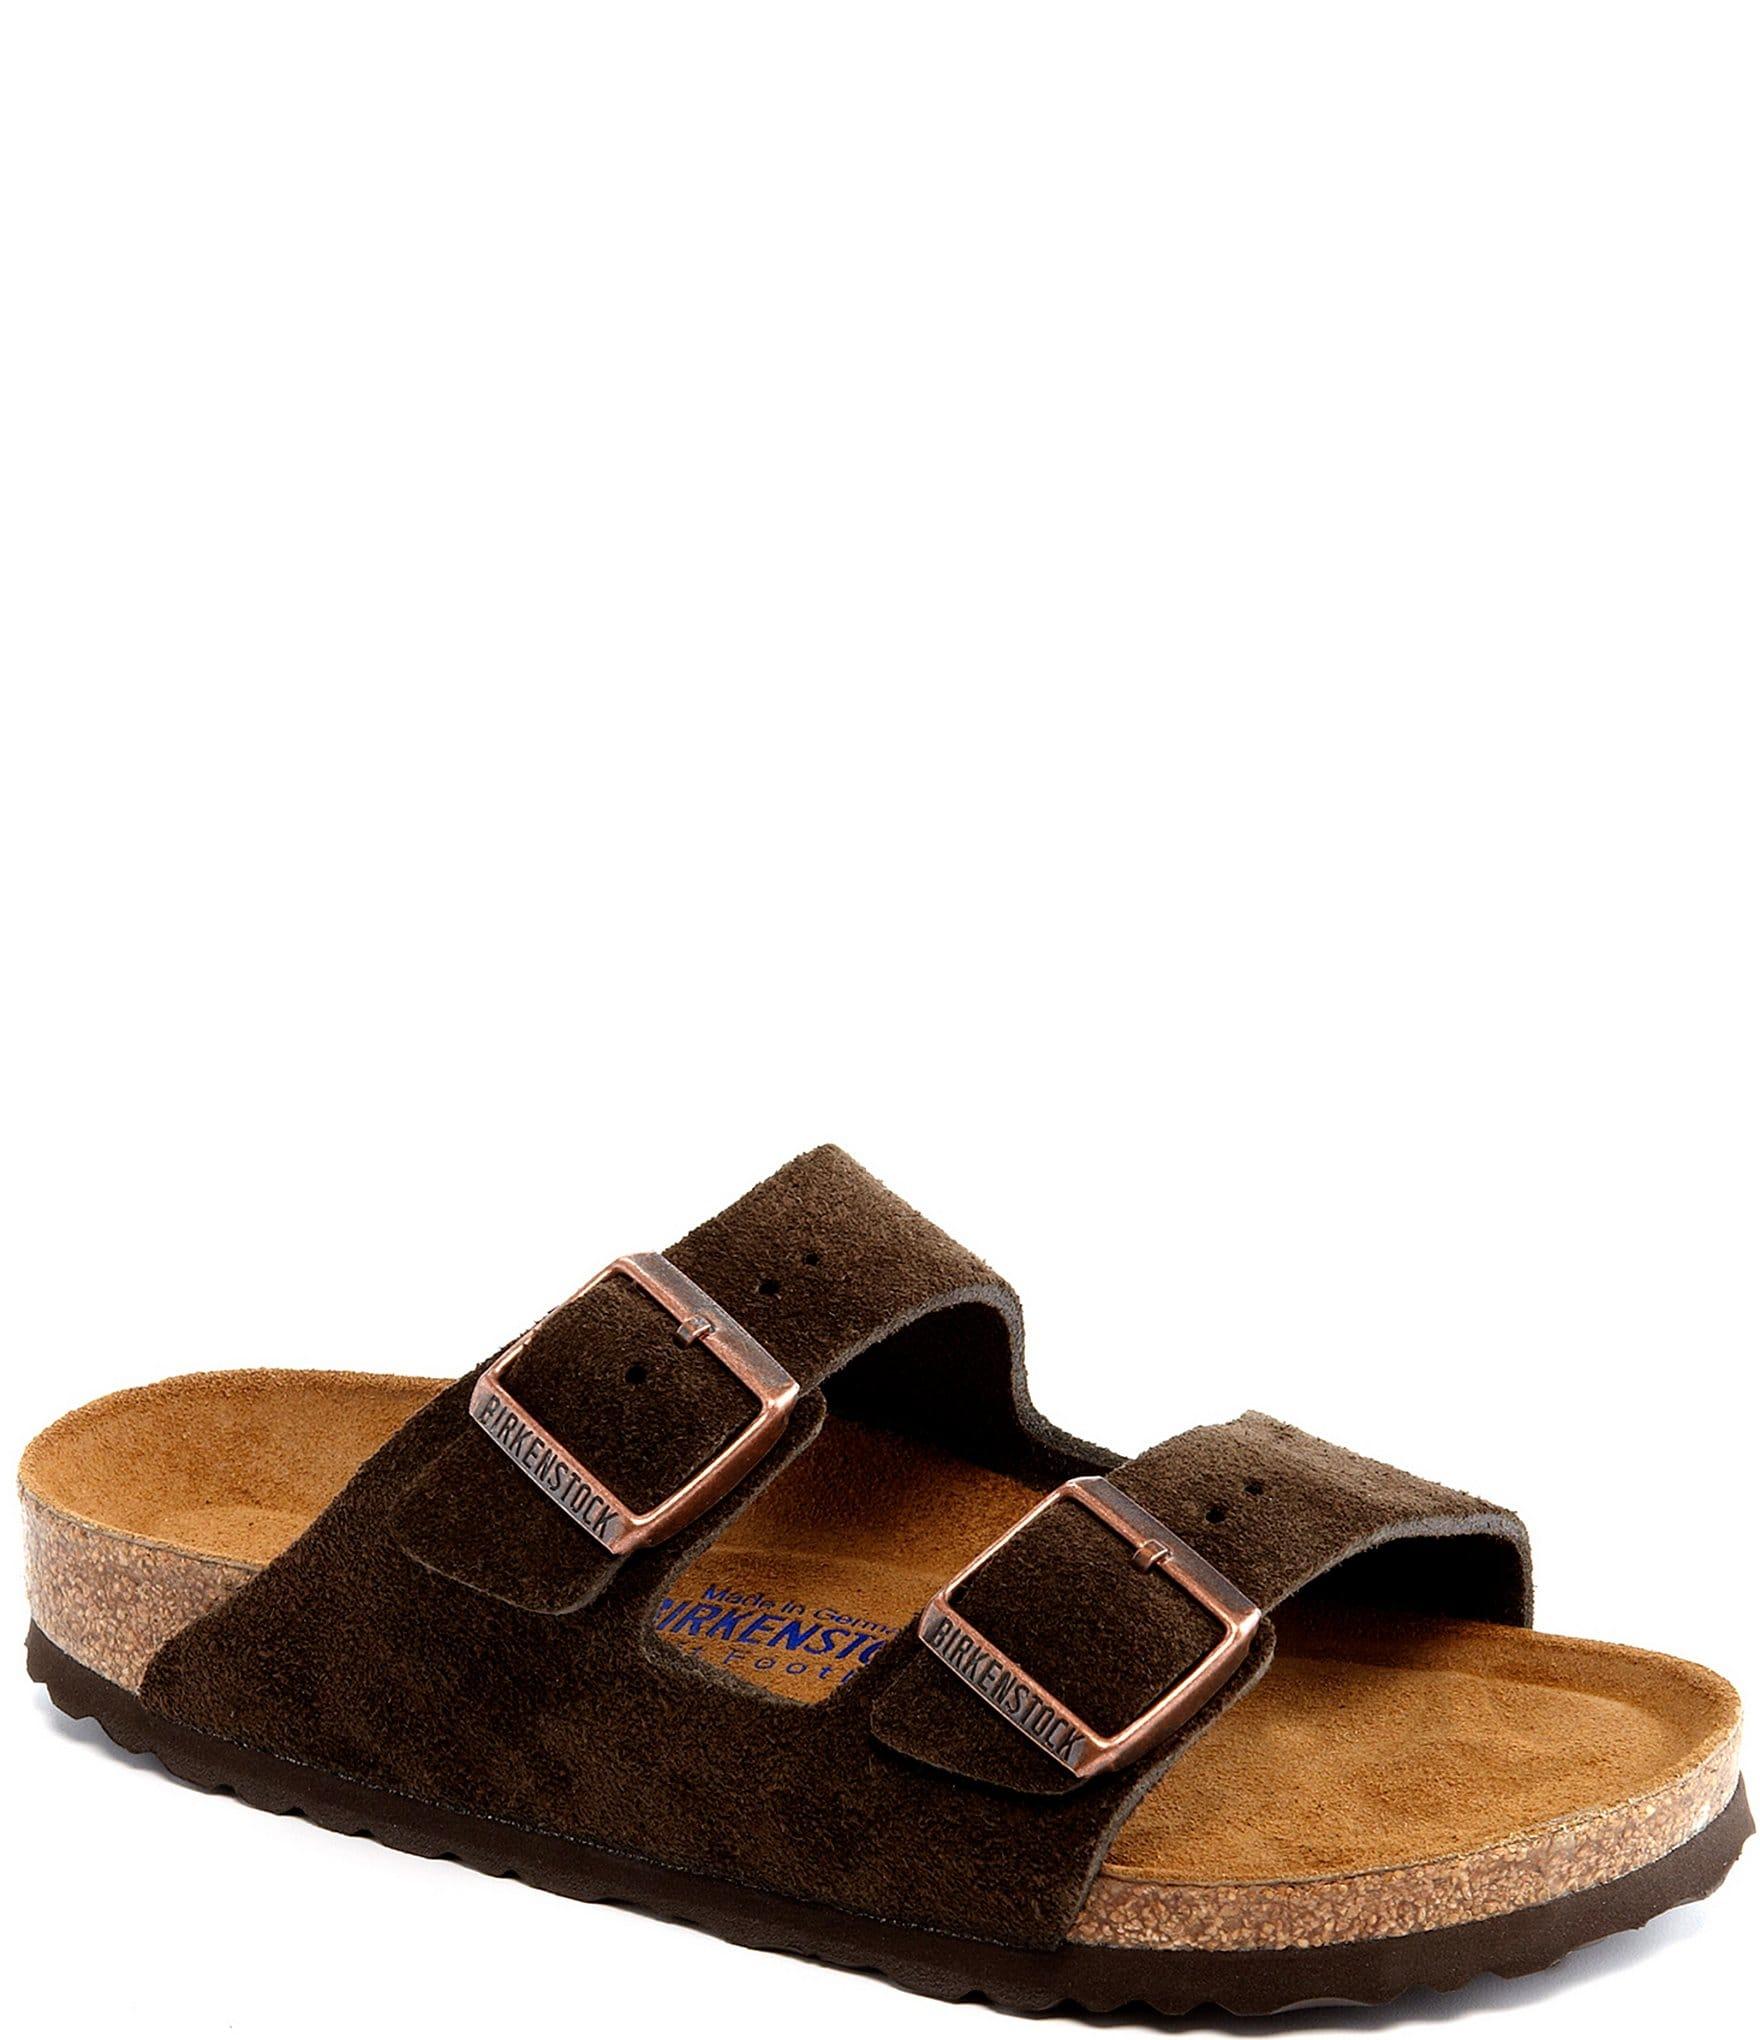 sports shoes online for sale huge discount Birkenstock Women's Arizona Suede Dual Adjustable Buckle Strap Sandals